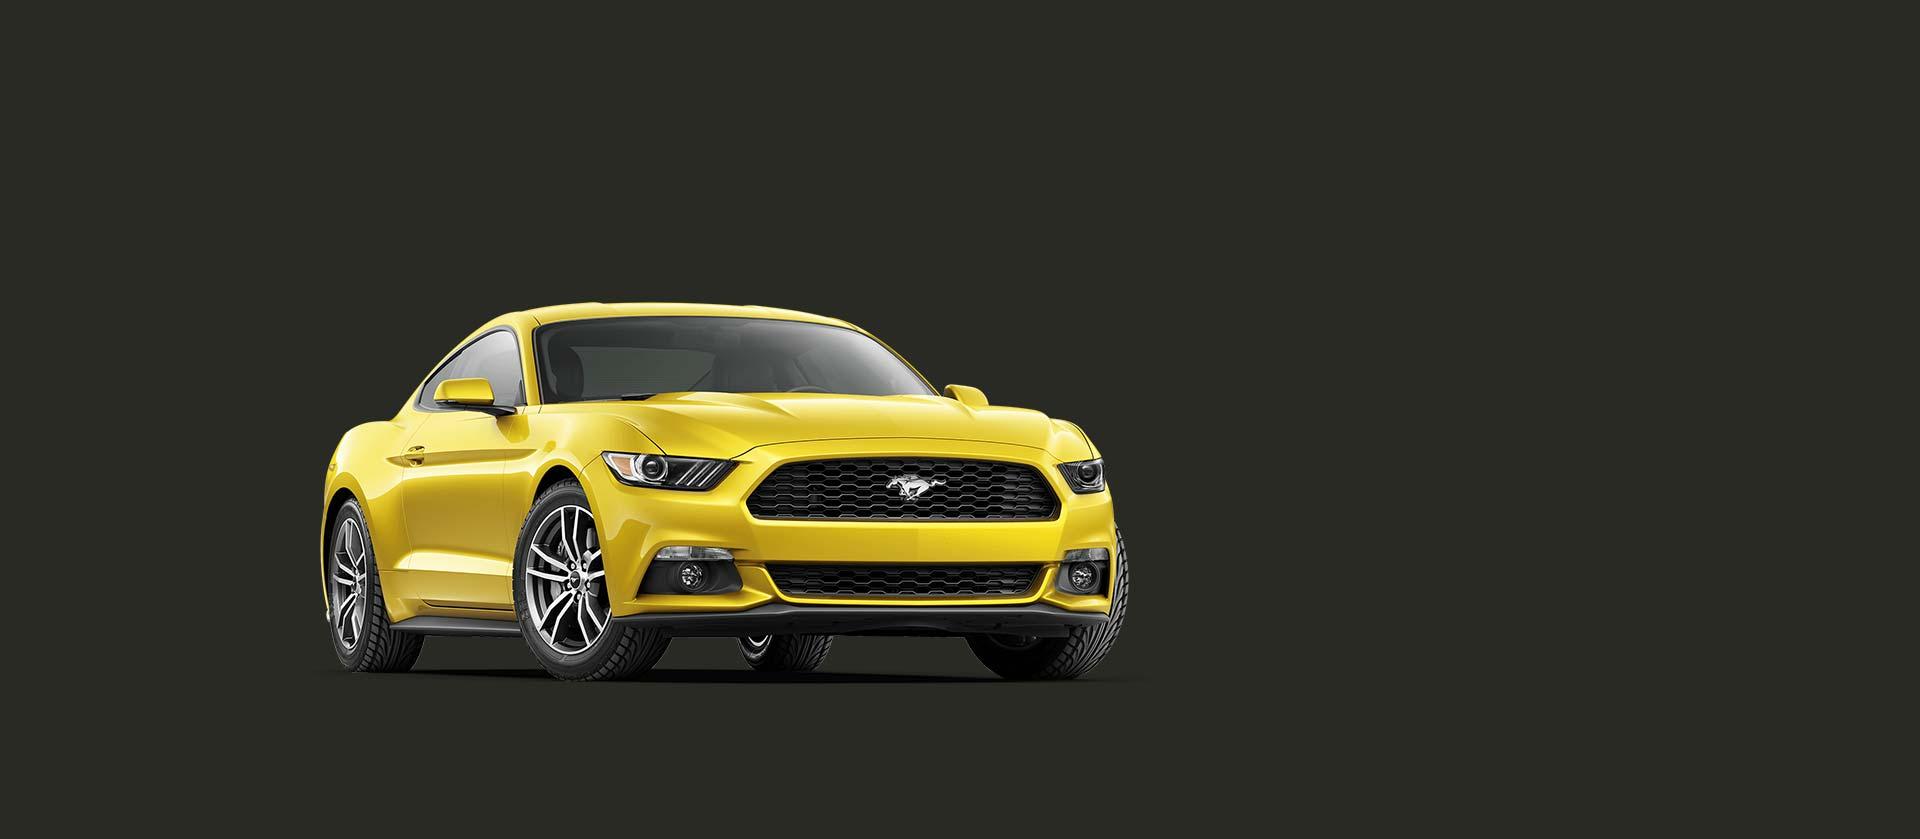 Trendy Sports Cars